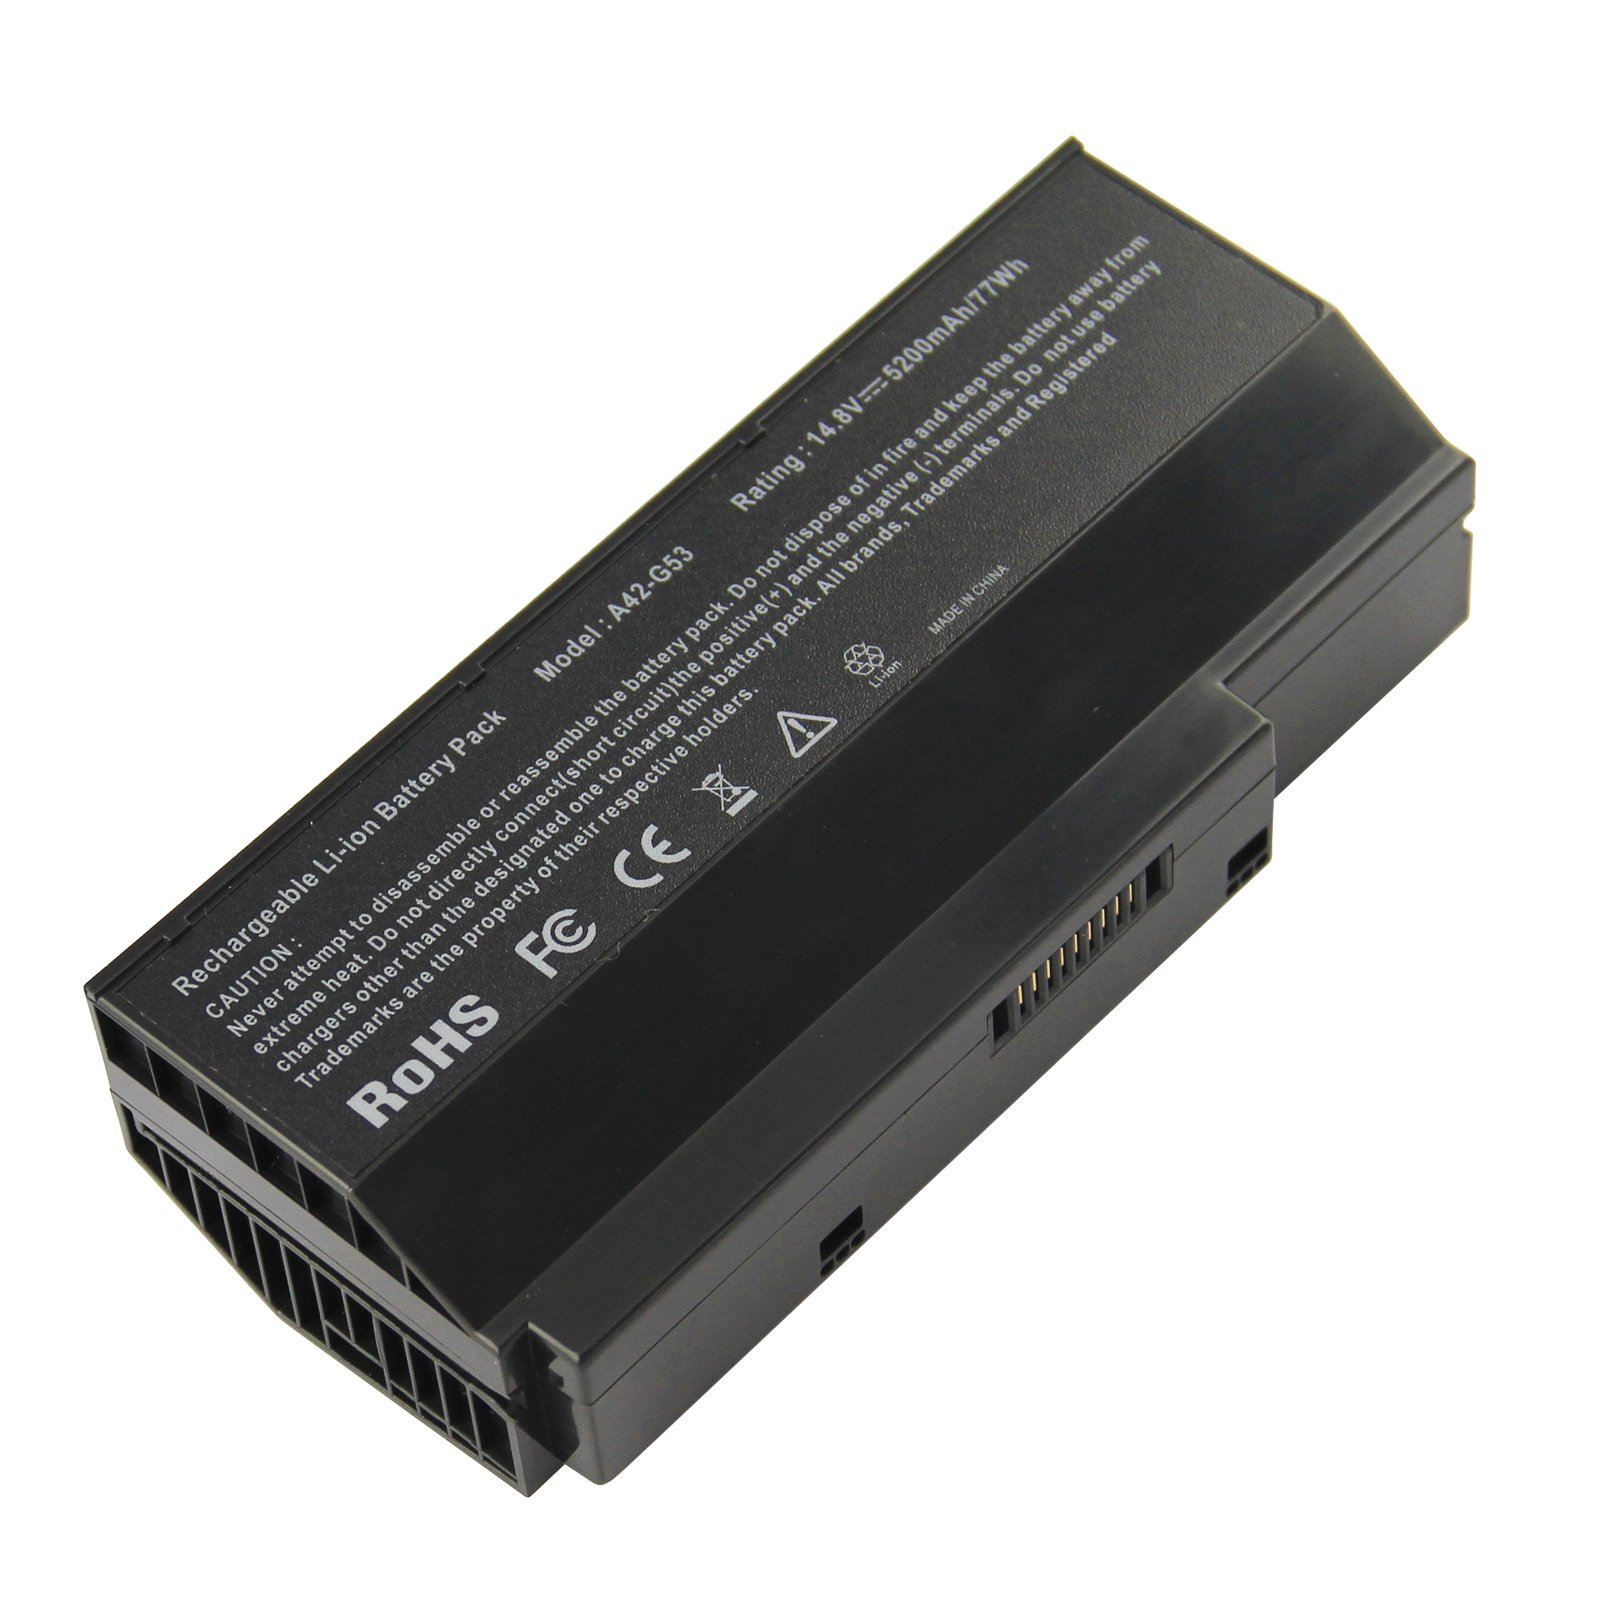 Bateria Para Asus A42-g73 G73-52 70-ny81b1000z G53 G53j G53jh G53jq G53jw G53jx G53s G53sv G53sw G53sx G73 G73g G73gw G7